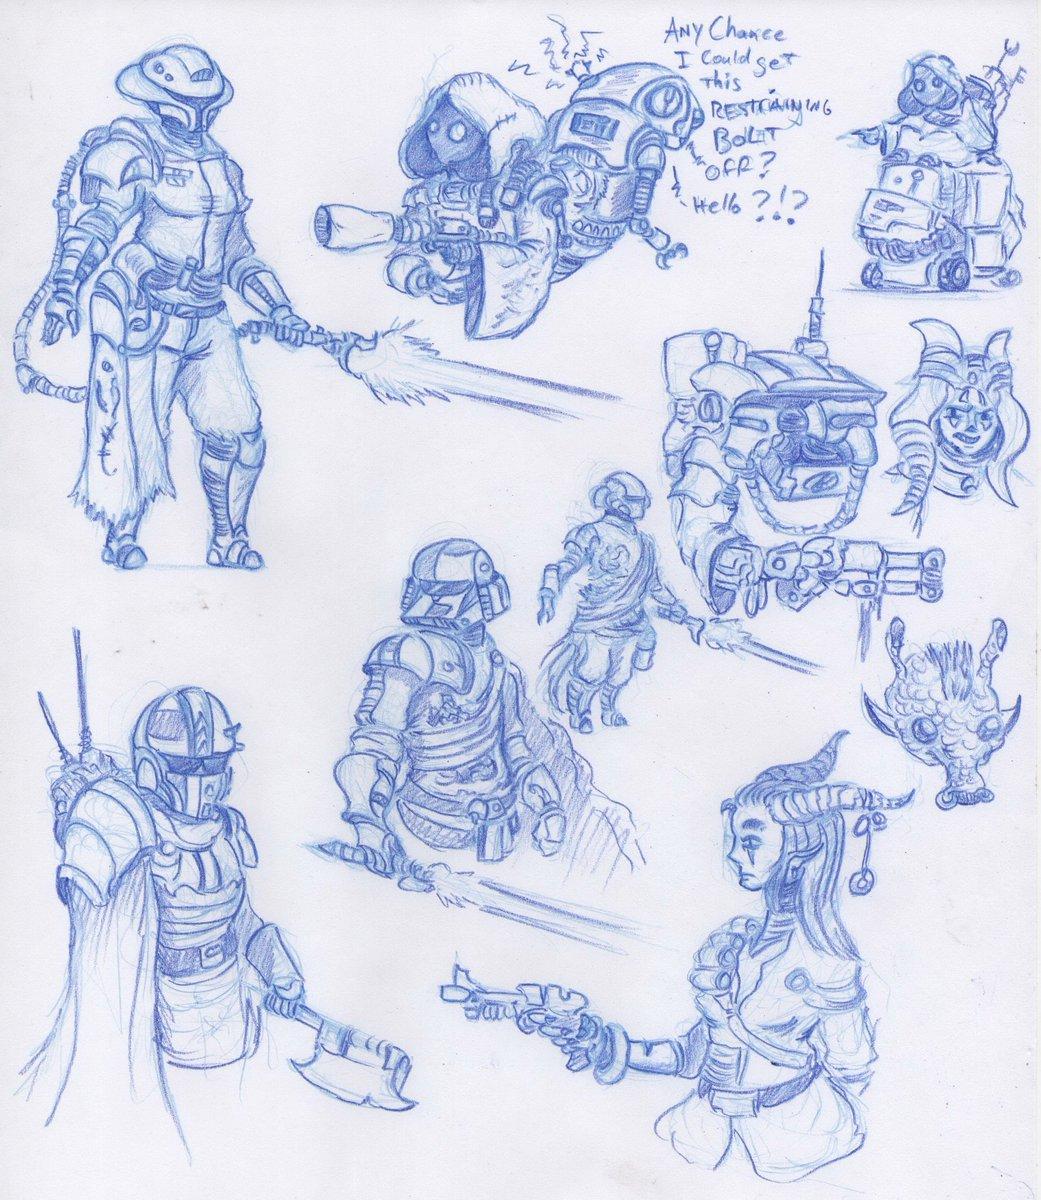 More #StarWars Rando Ralrissians   #art #sketches #doodles #fanart #artisttwitter #jedi #sith #jawas #jawa #droids #droid<br>http://pic.twitter.com/o0YMHSoHlj